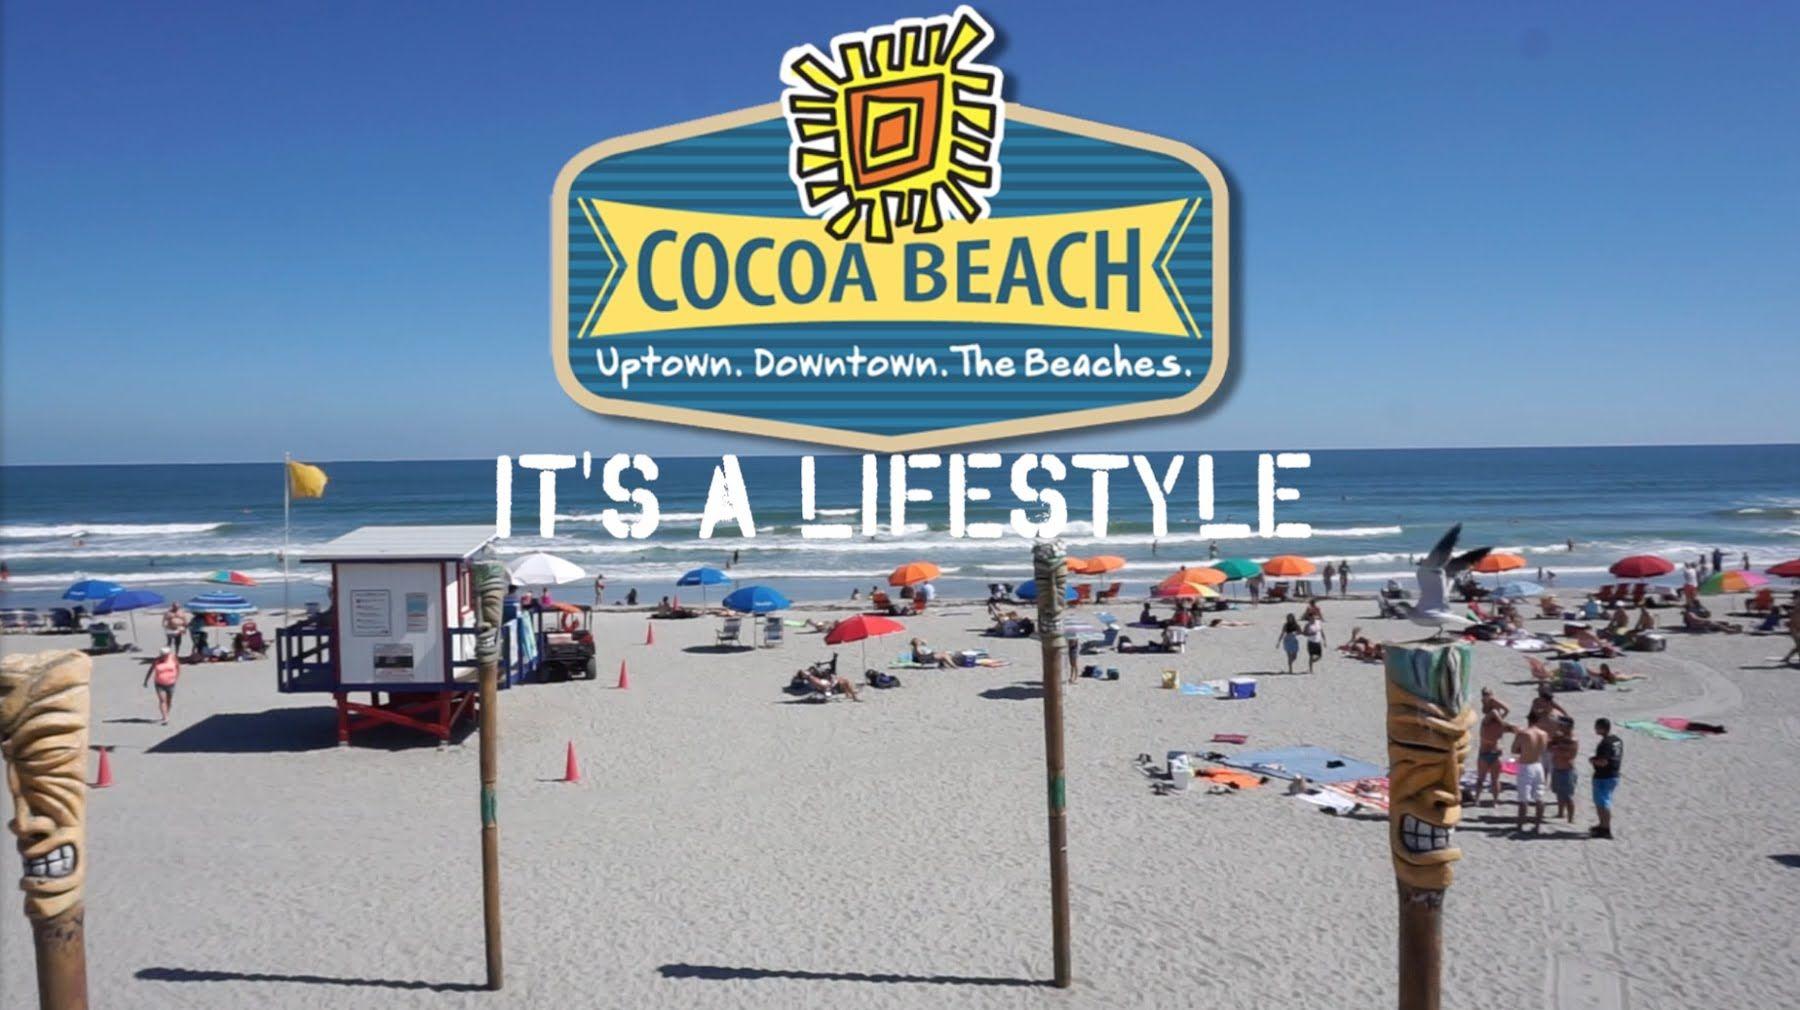 "Cocoa Beach ""It's A Lifestyle"" Cocoa beach florida"